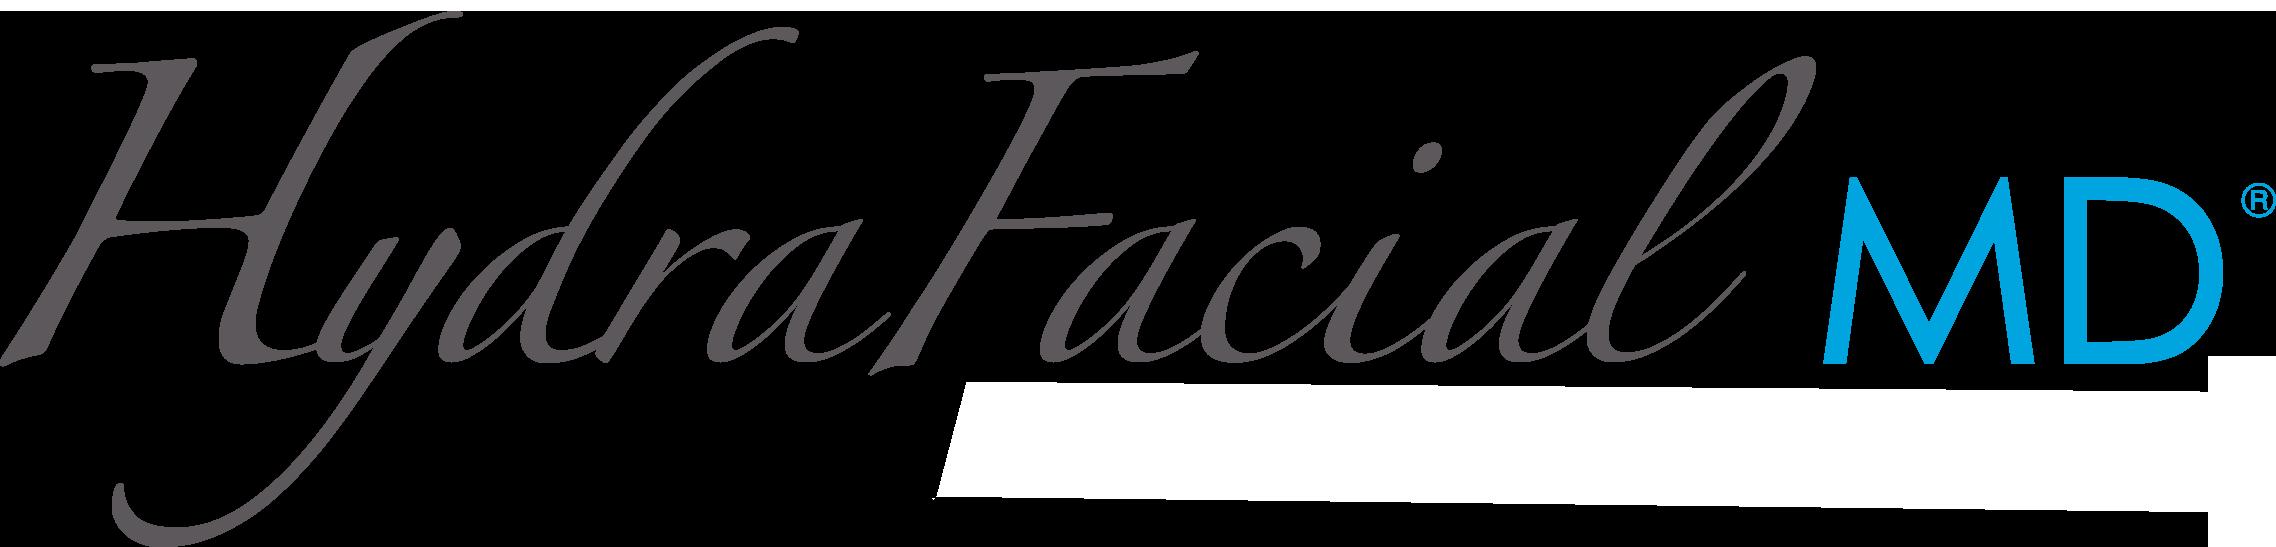 https://evahaircut.ro/wp-content/uploads/2020/04/HydraFacial-Logo-Rebrand_DE.png